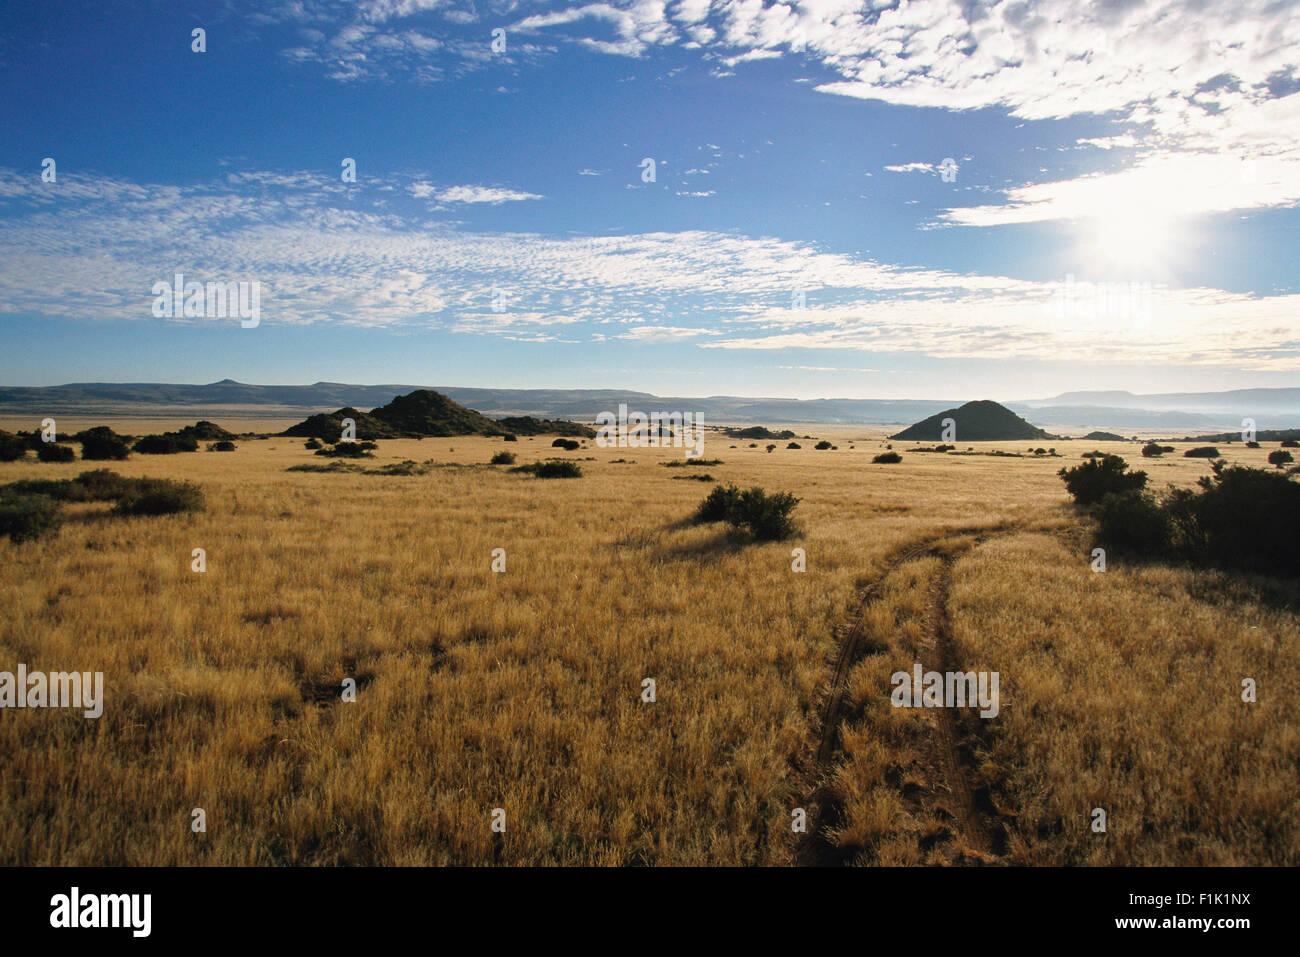 Tire Tracks, Karoo, Western Cape, Cape Province, South Africa - Stock Image